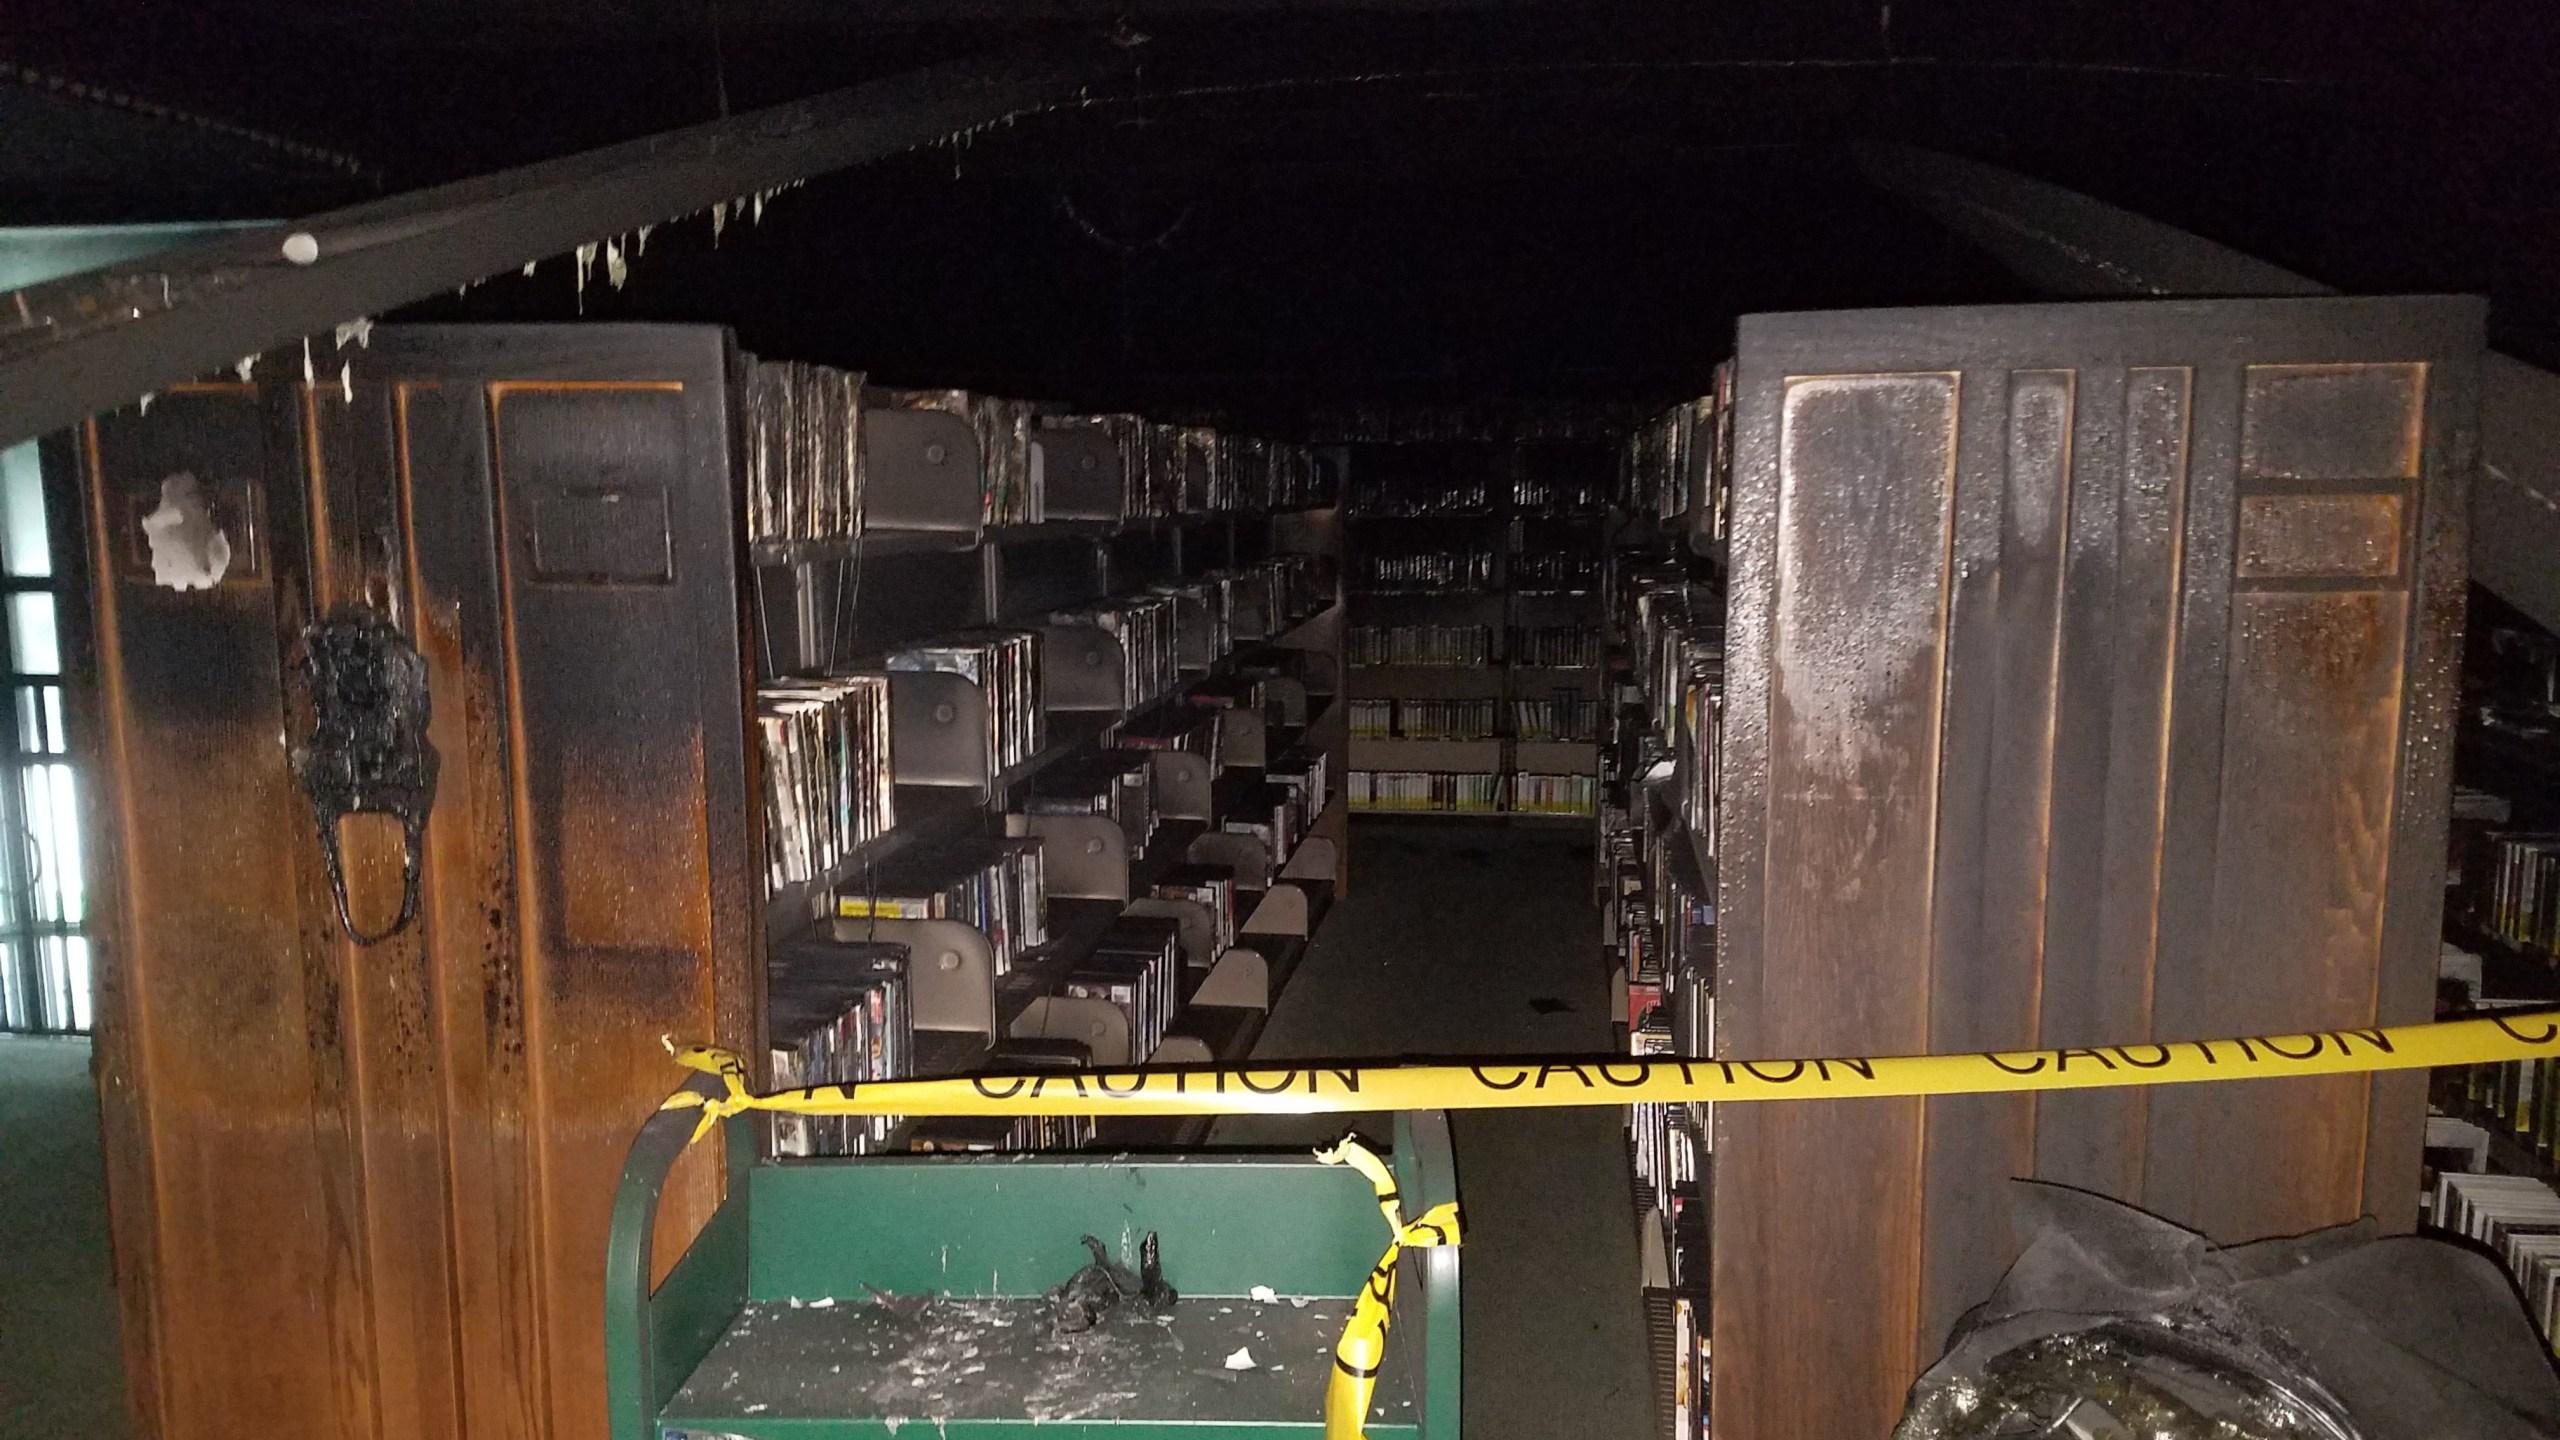 Eckhart Public Library Fire Damage_272110